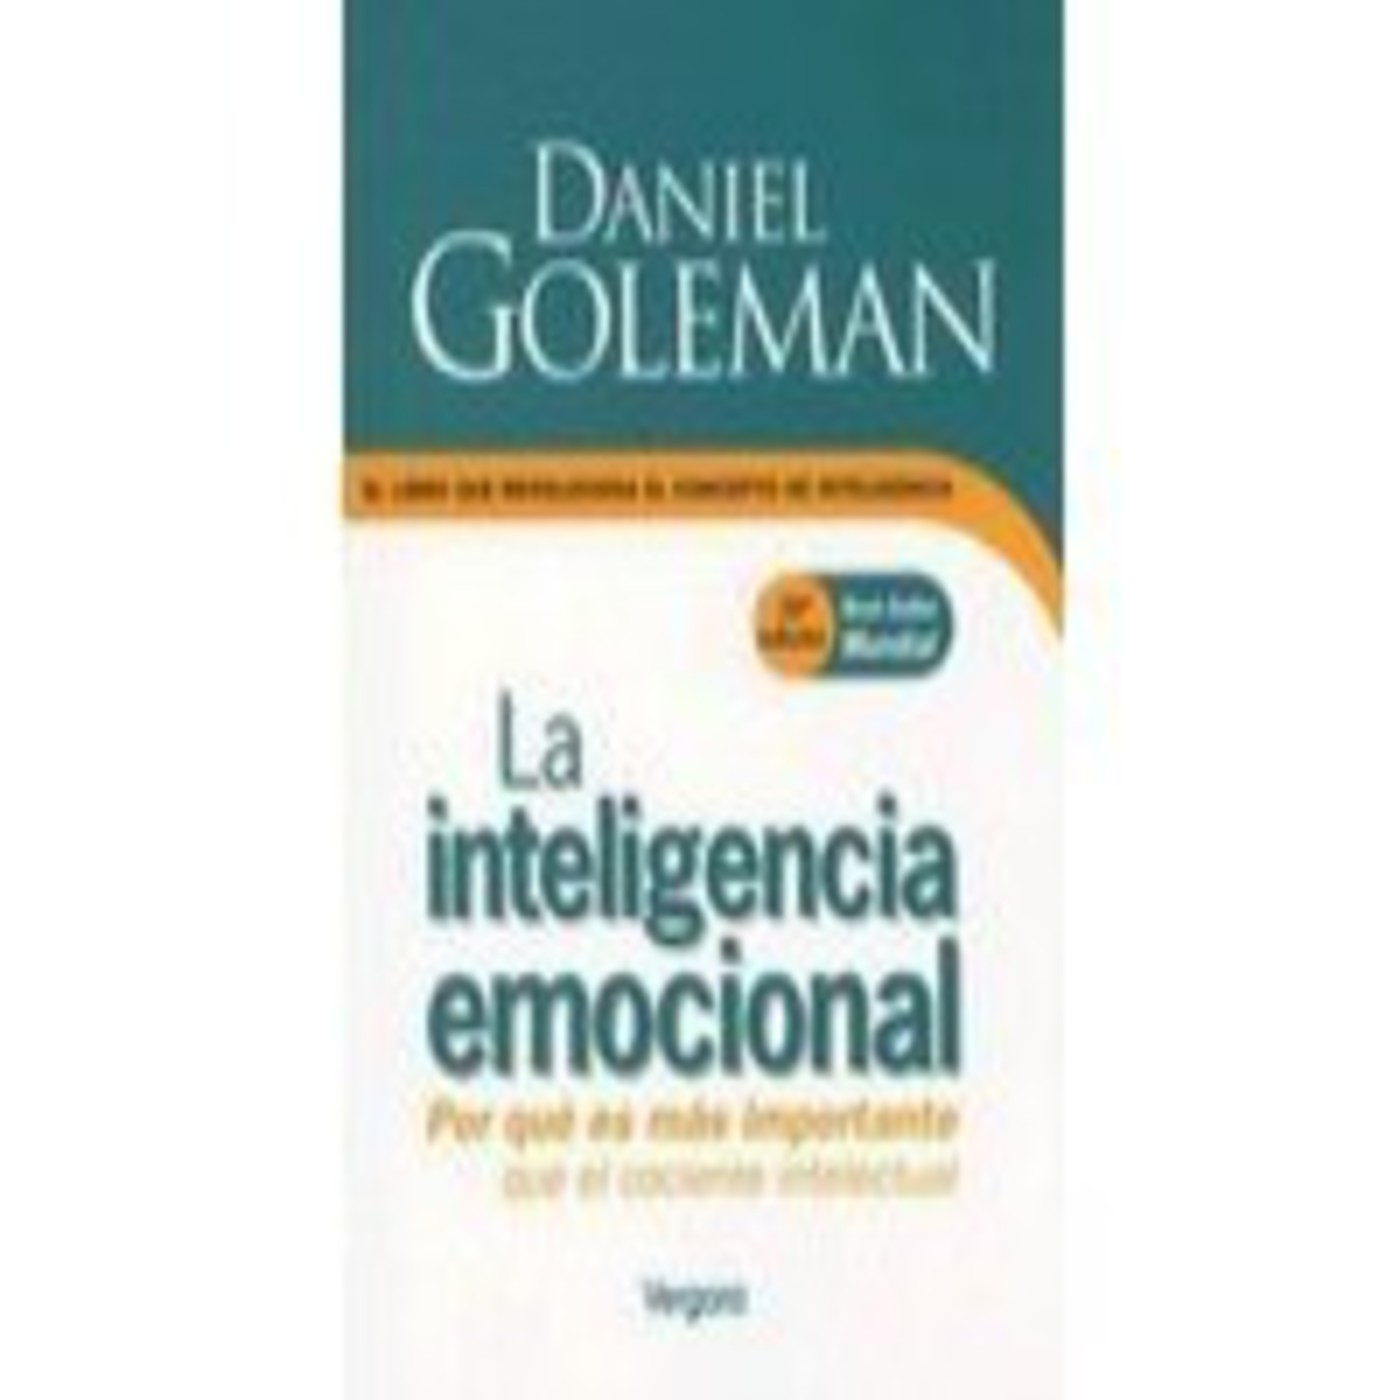 41..INTELIGENCIA EMOCIONAL, Daniel Goleman